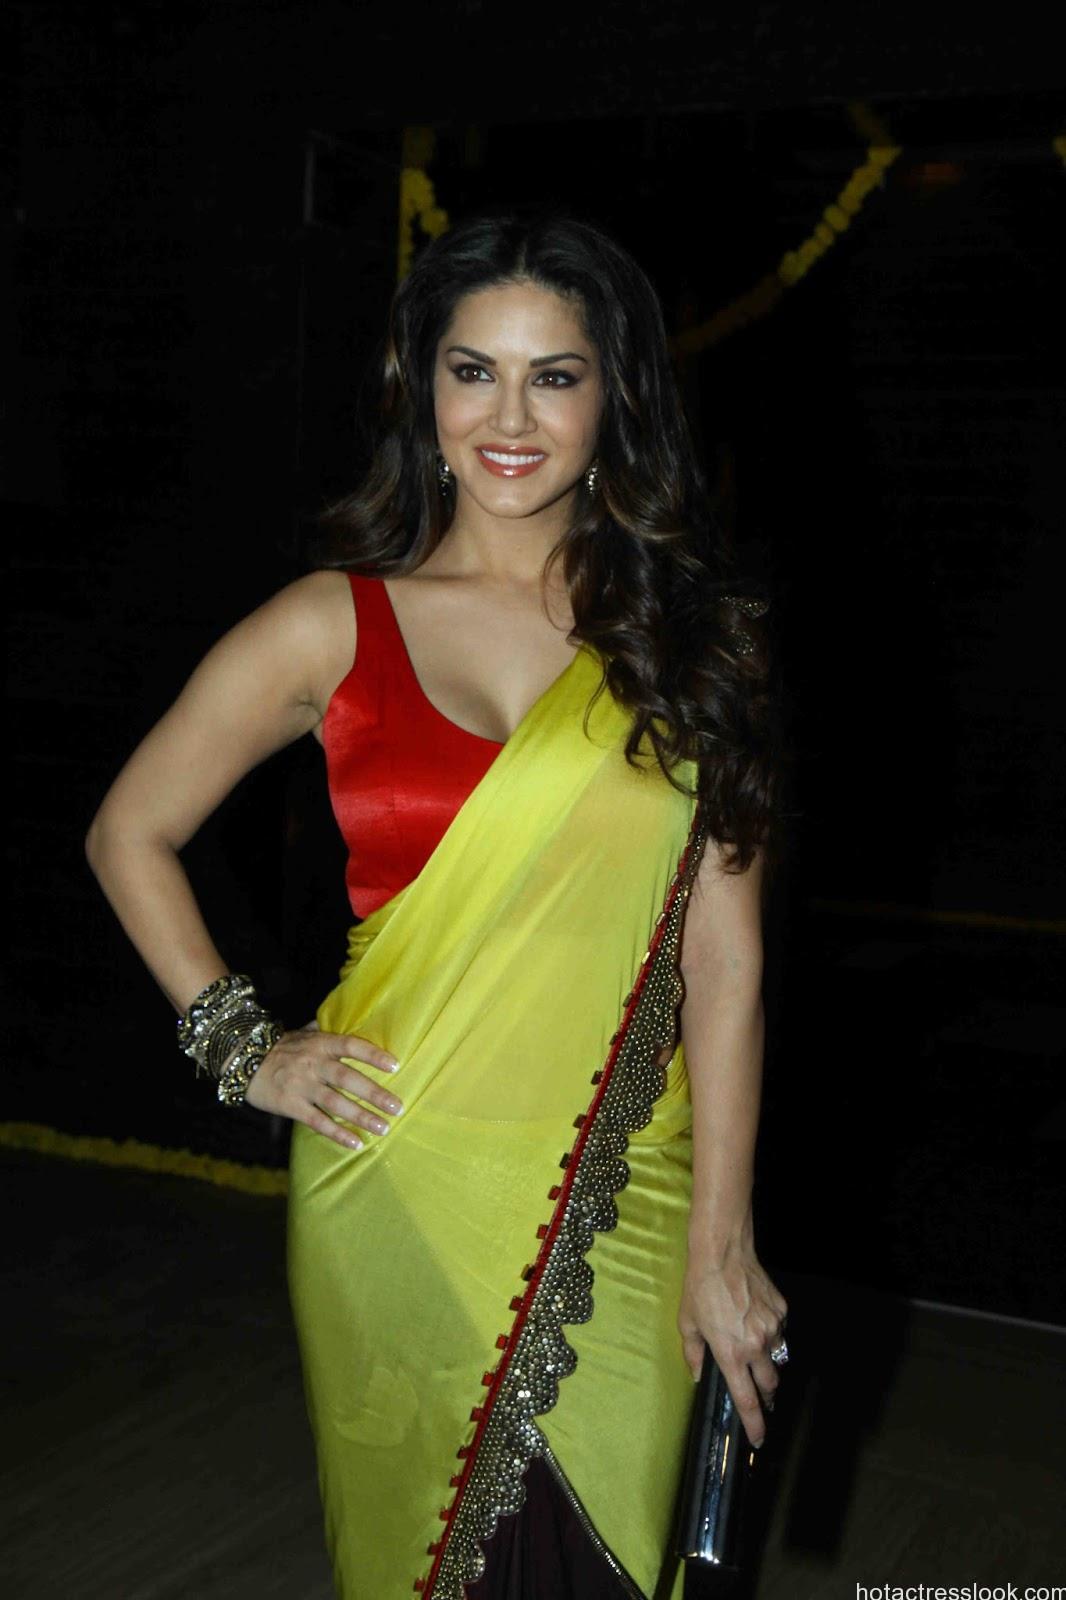 Hot Image Of Sunny Leone-1403